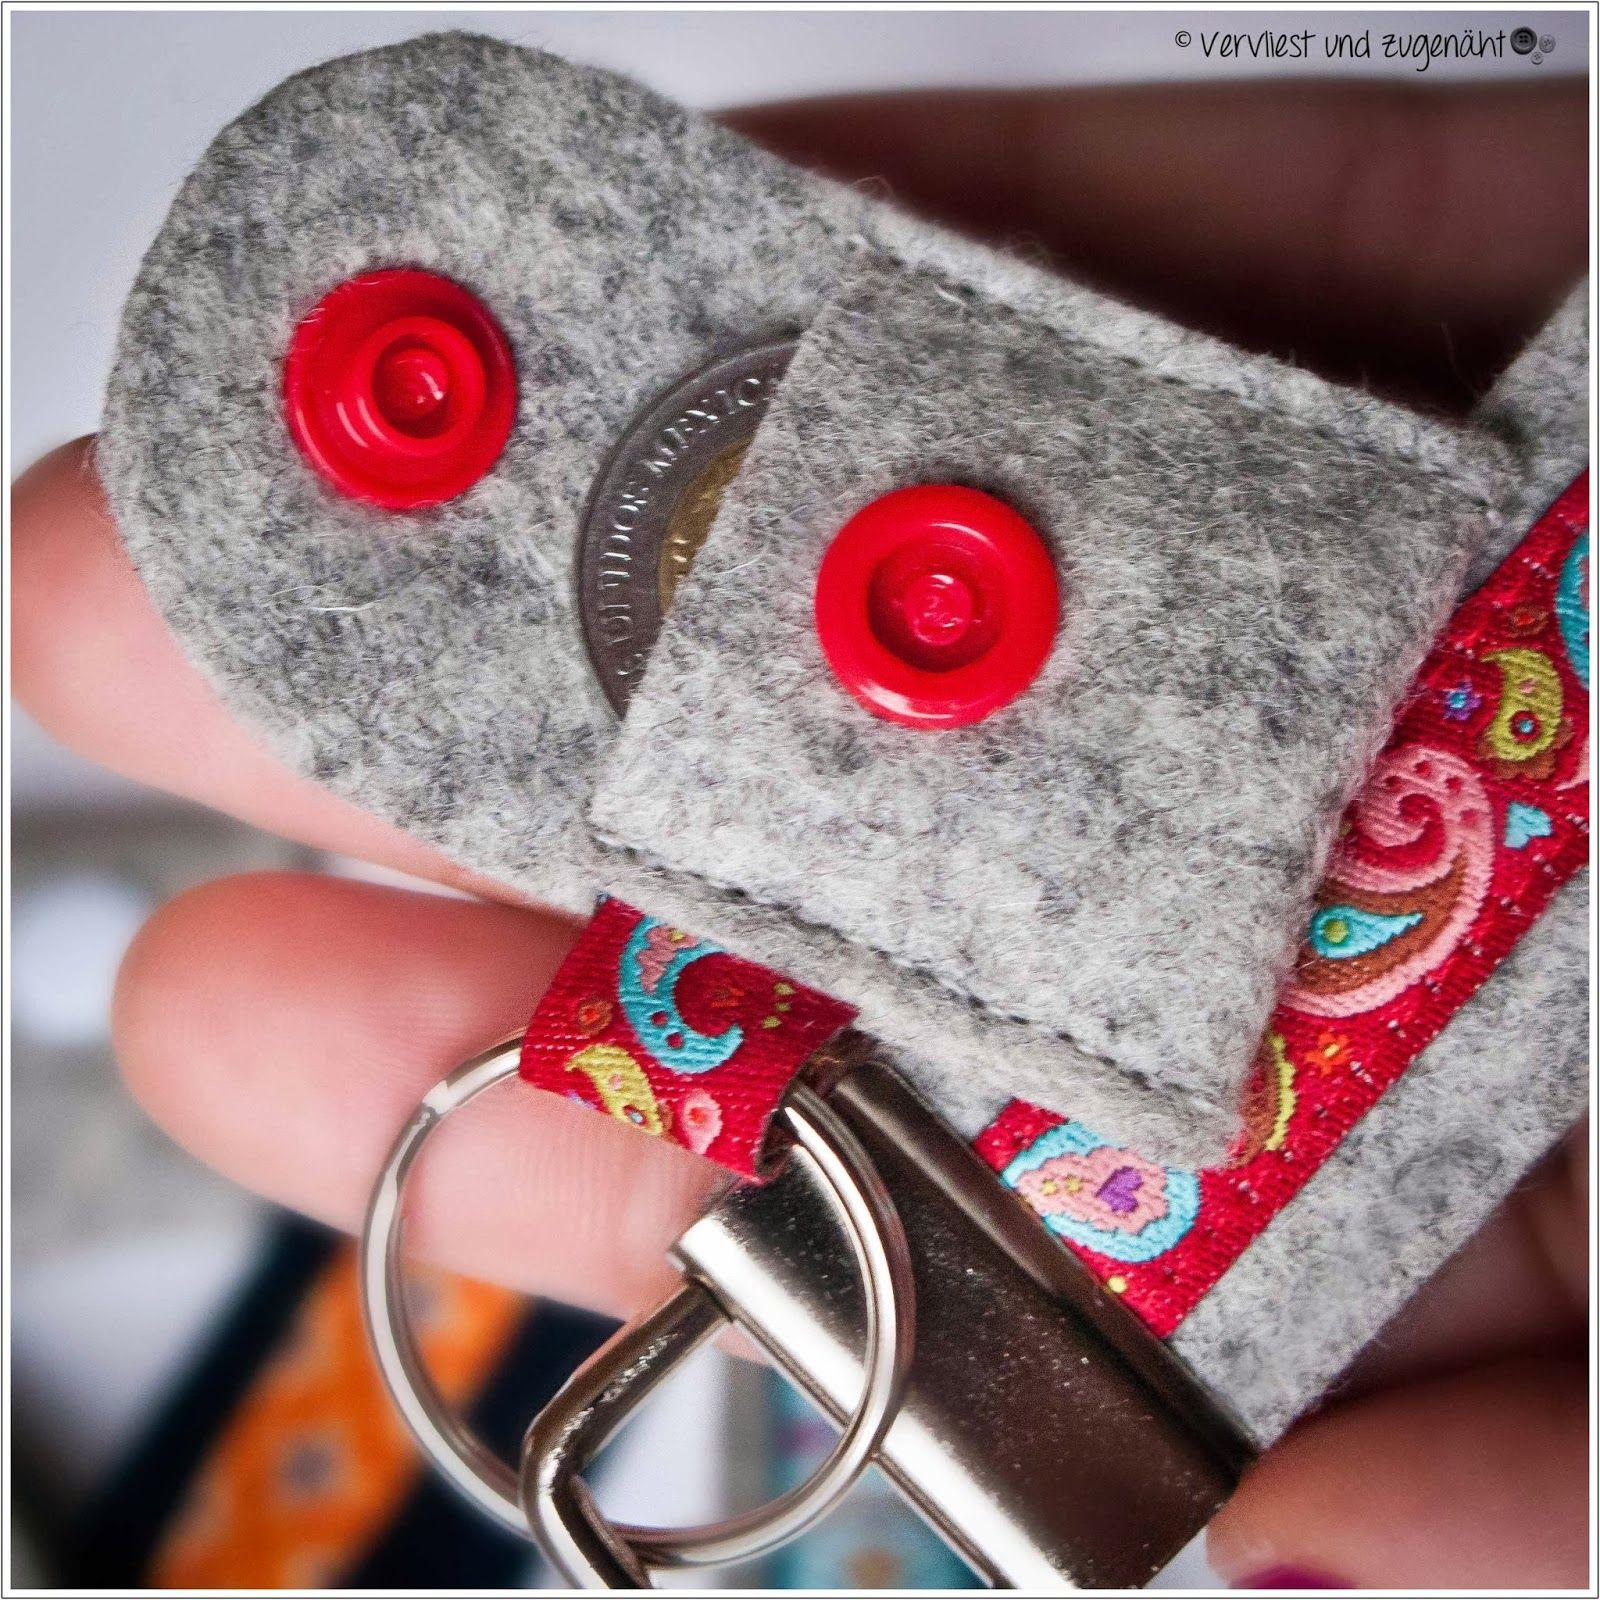 Pimp my Schlüsselanhänger! #fieltromanualidades